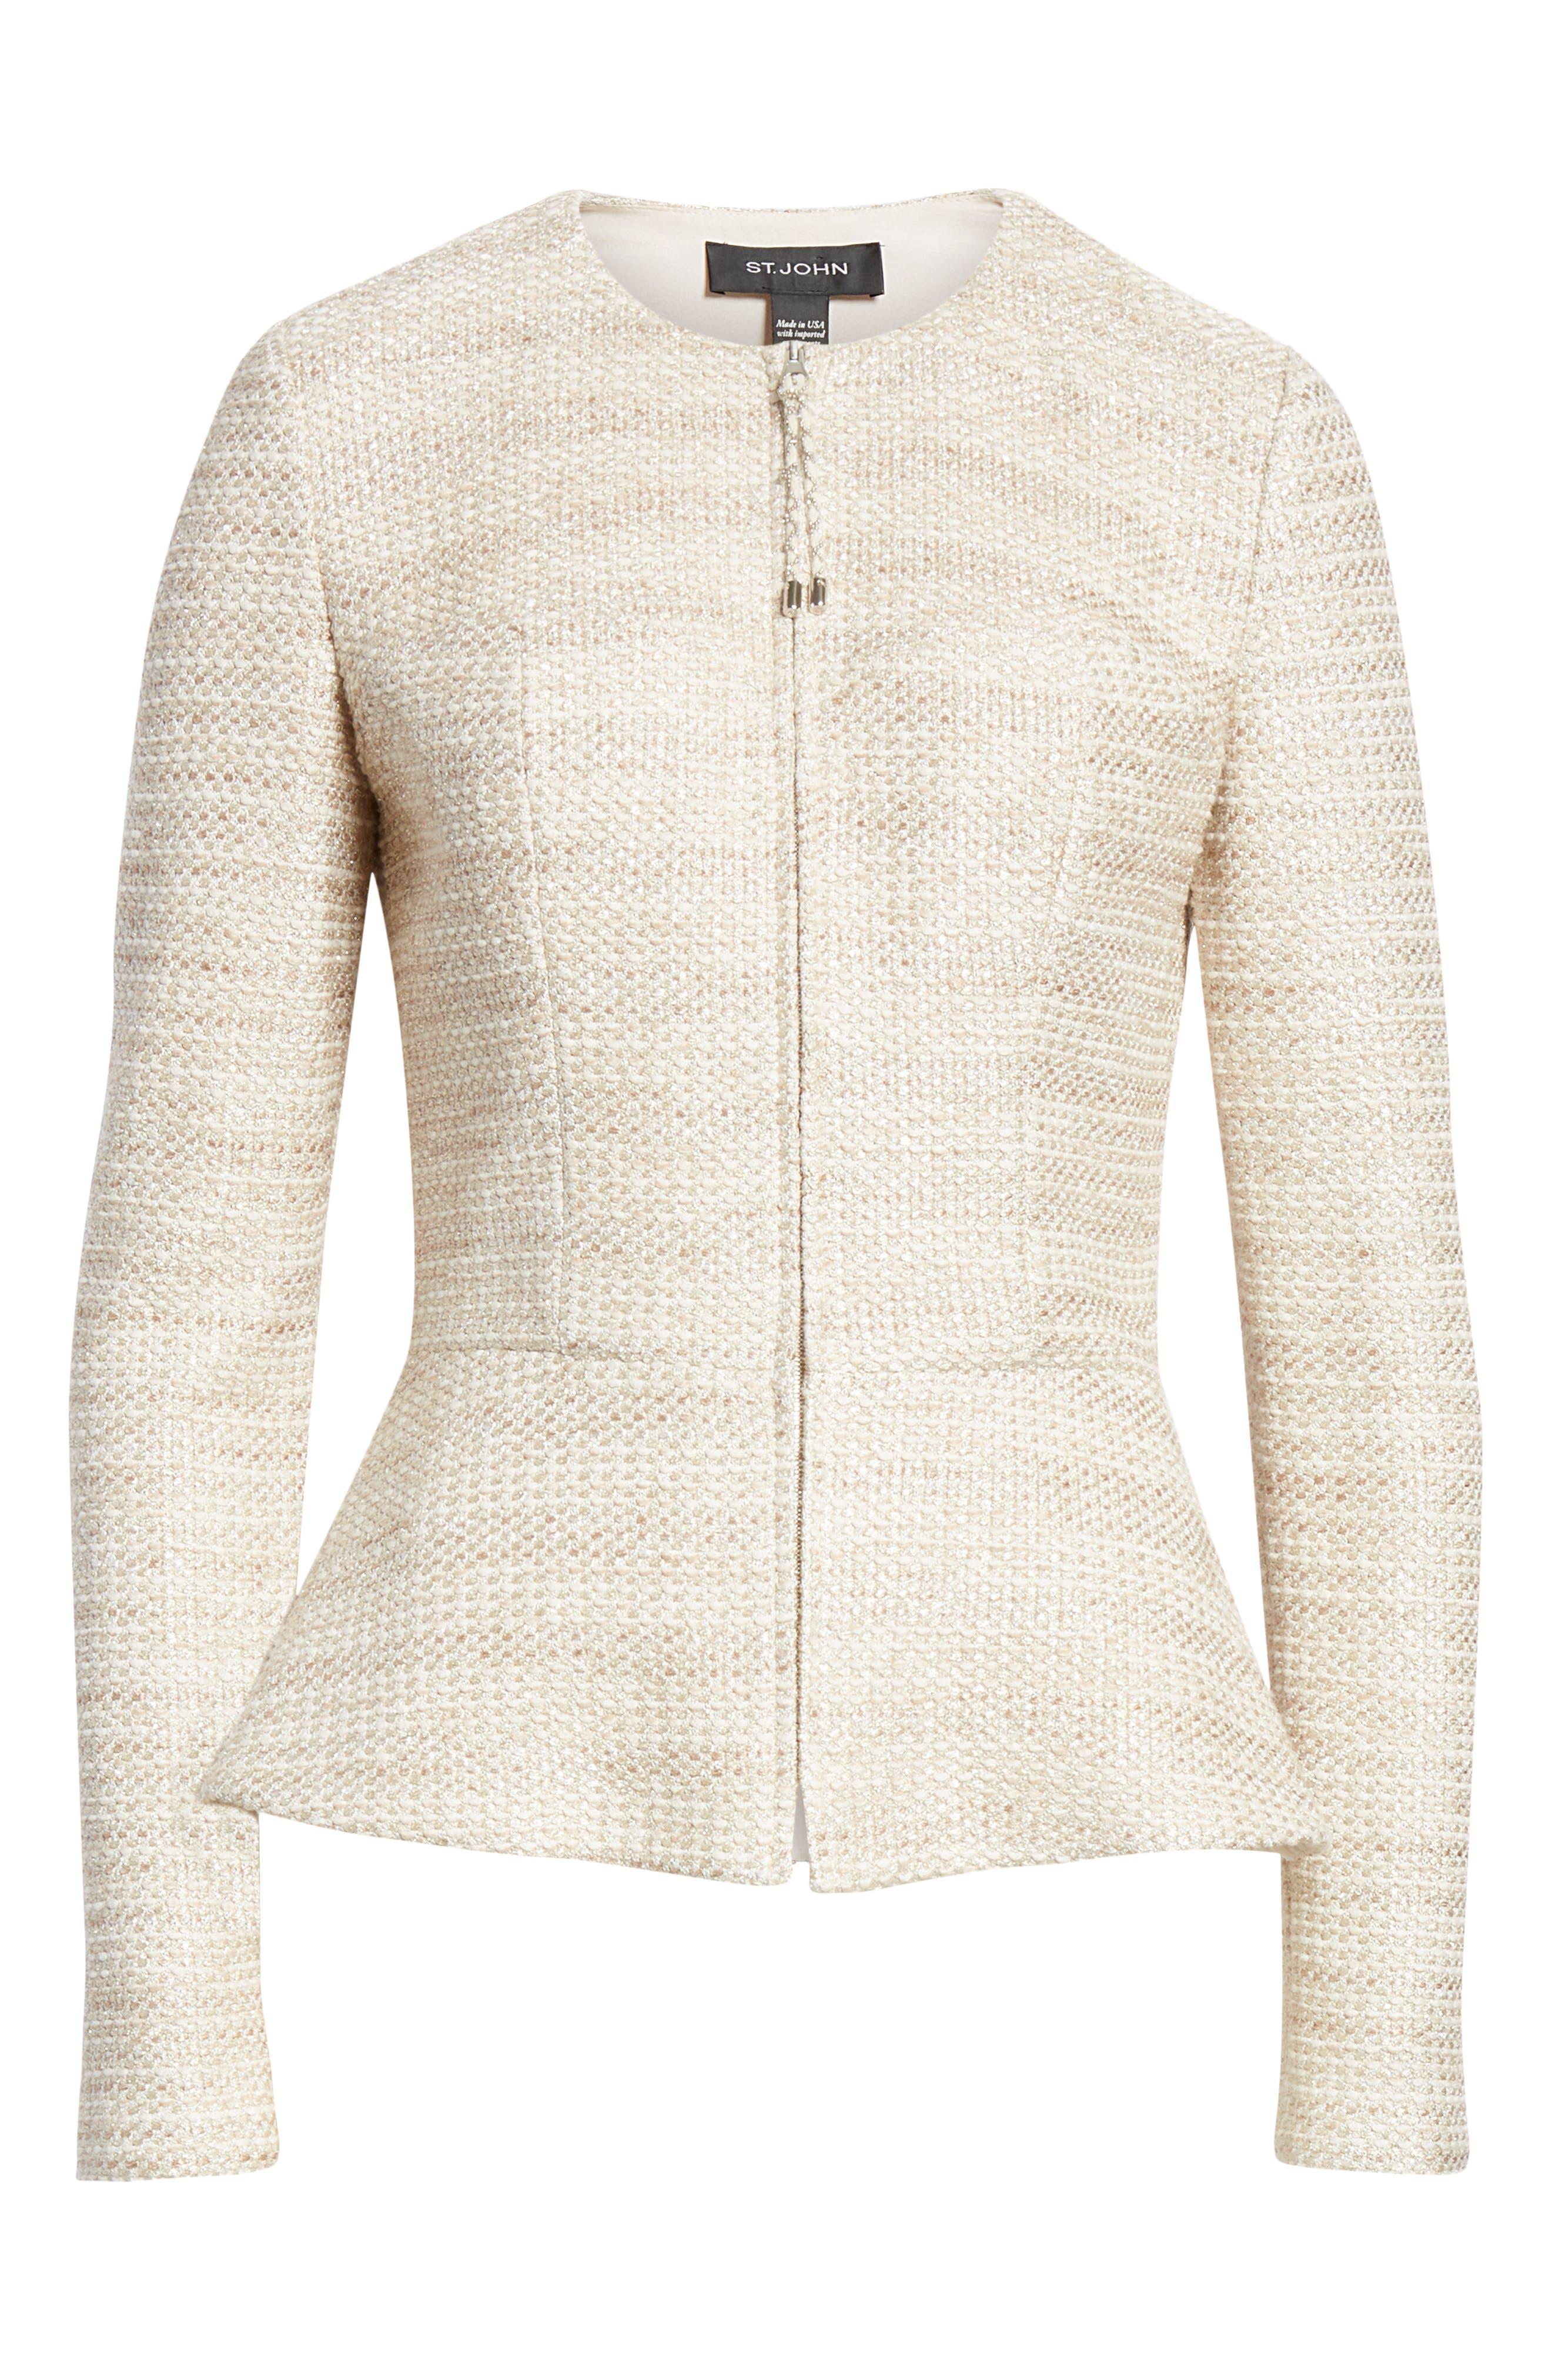 ST. JOHN COLLECTION, Antonella Knit Peplum Jacket, Alternate thumbnail 6, color, GOLD